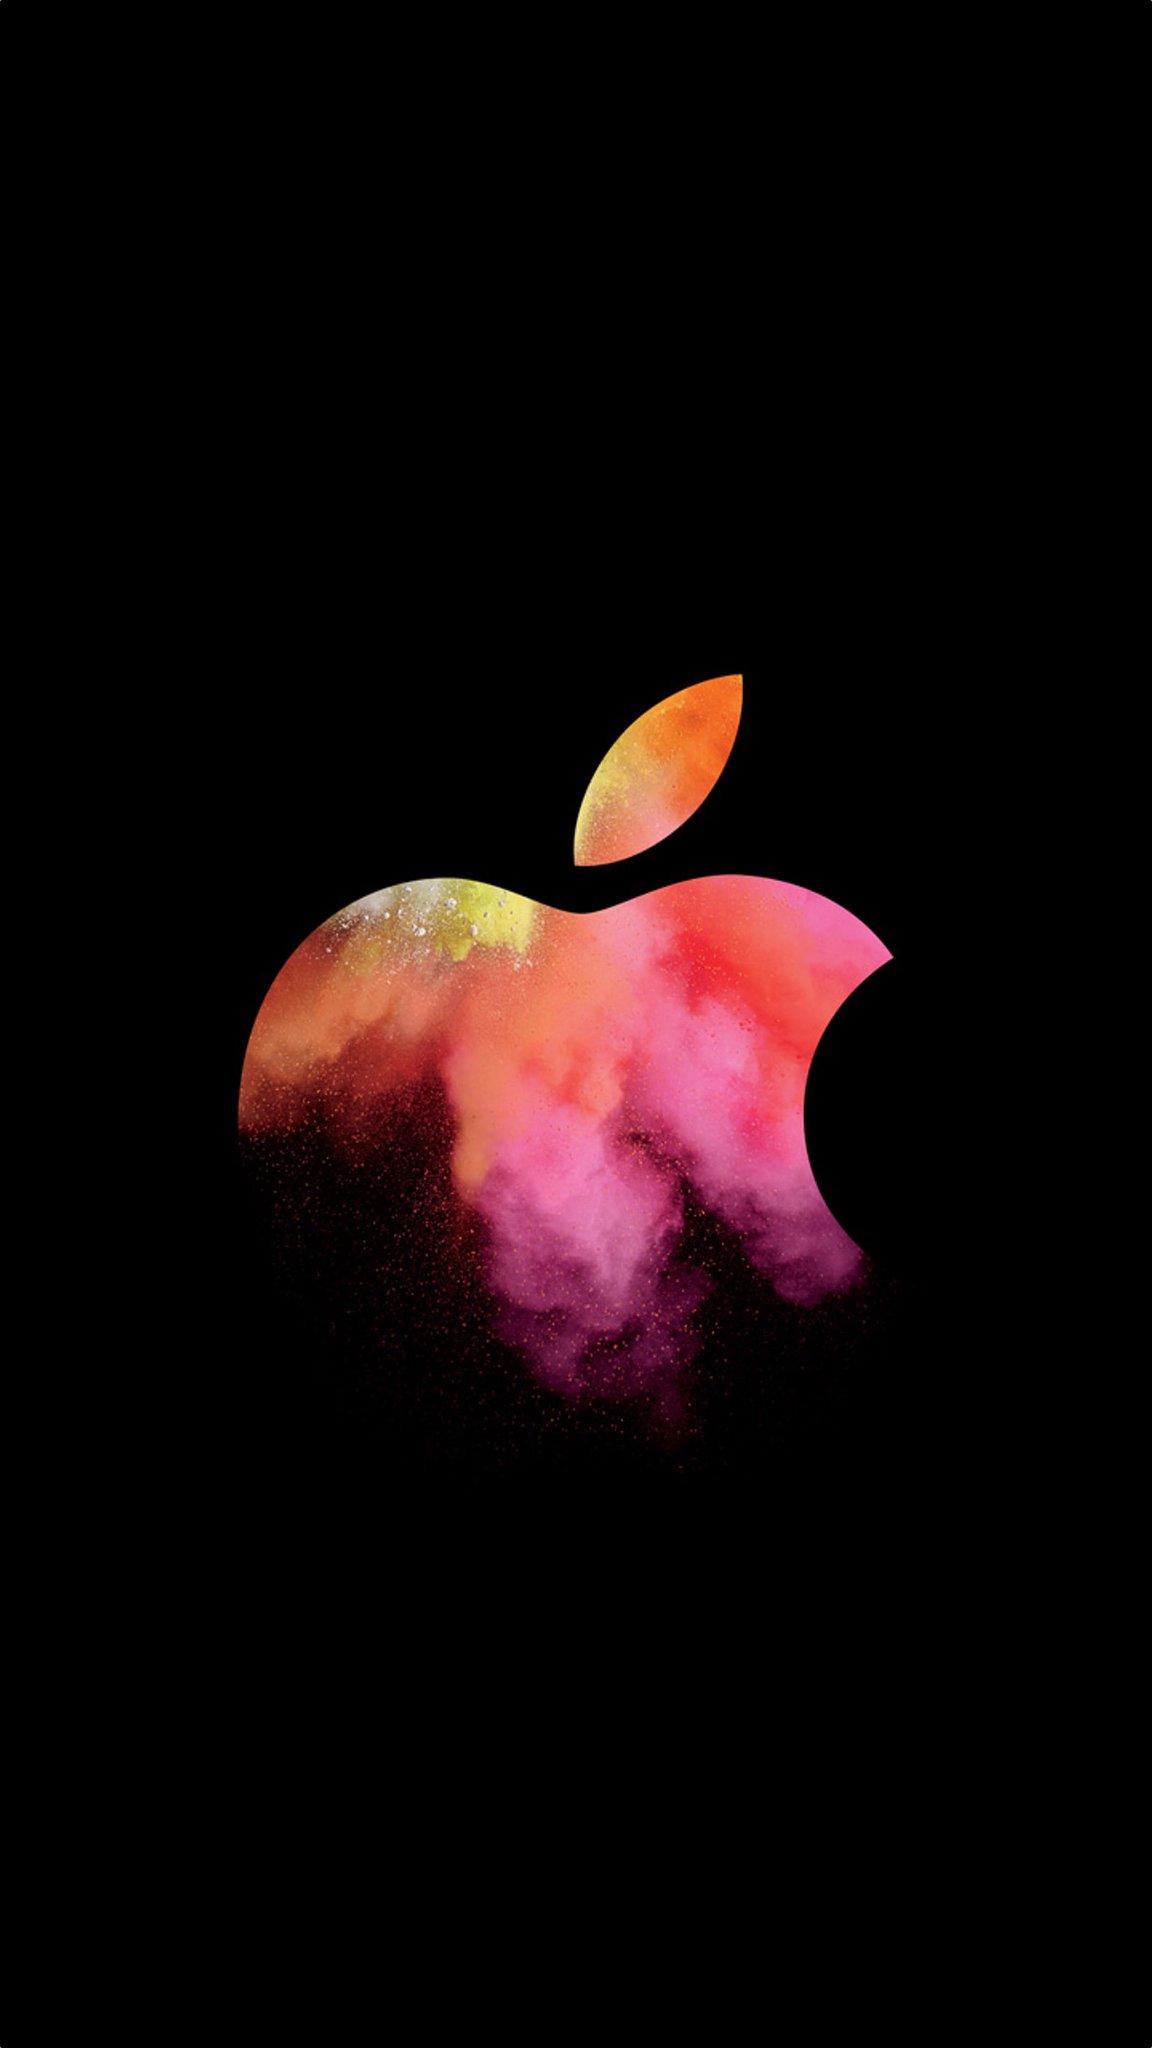 sebraynal_apple-october-27-media-event-hello-again